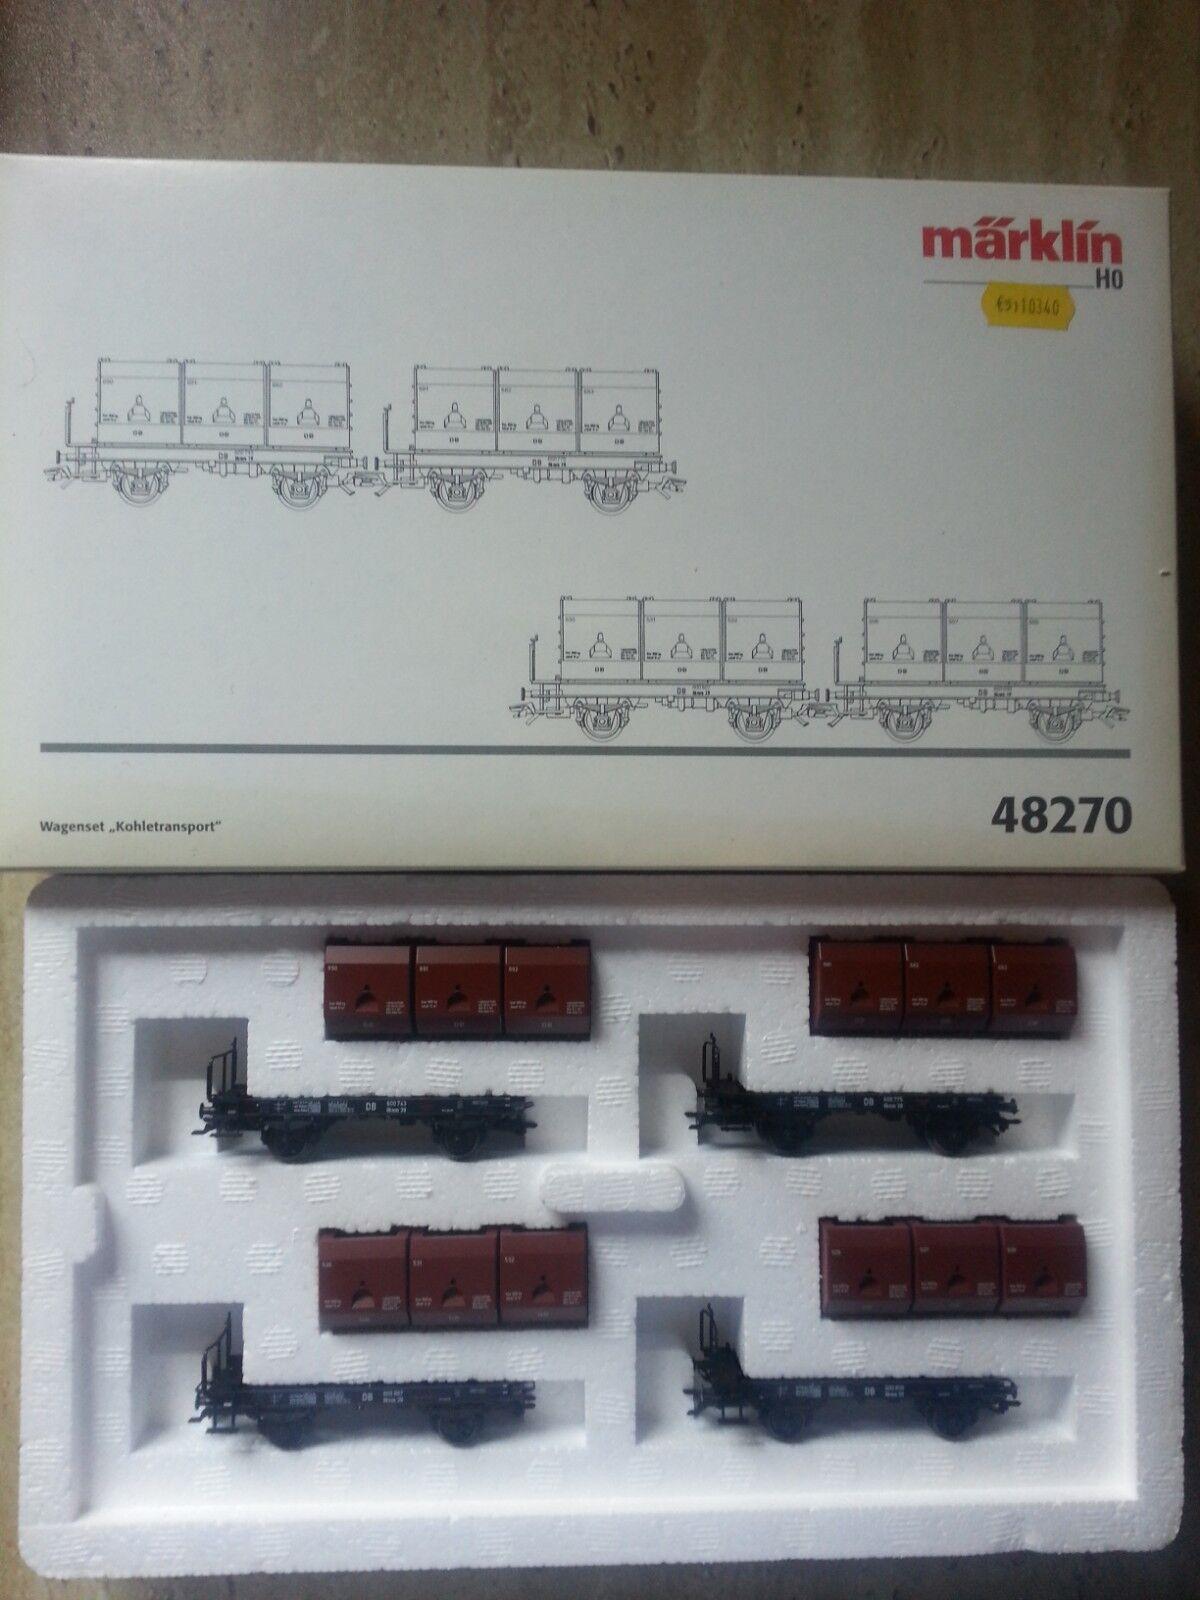 Marklin 48270 Wagenset Kohlen transport